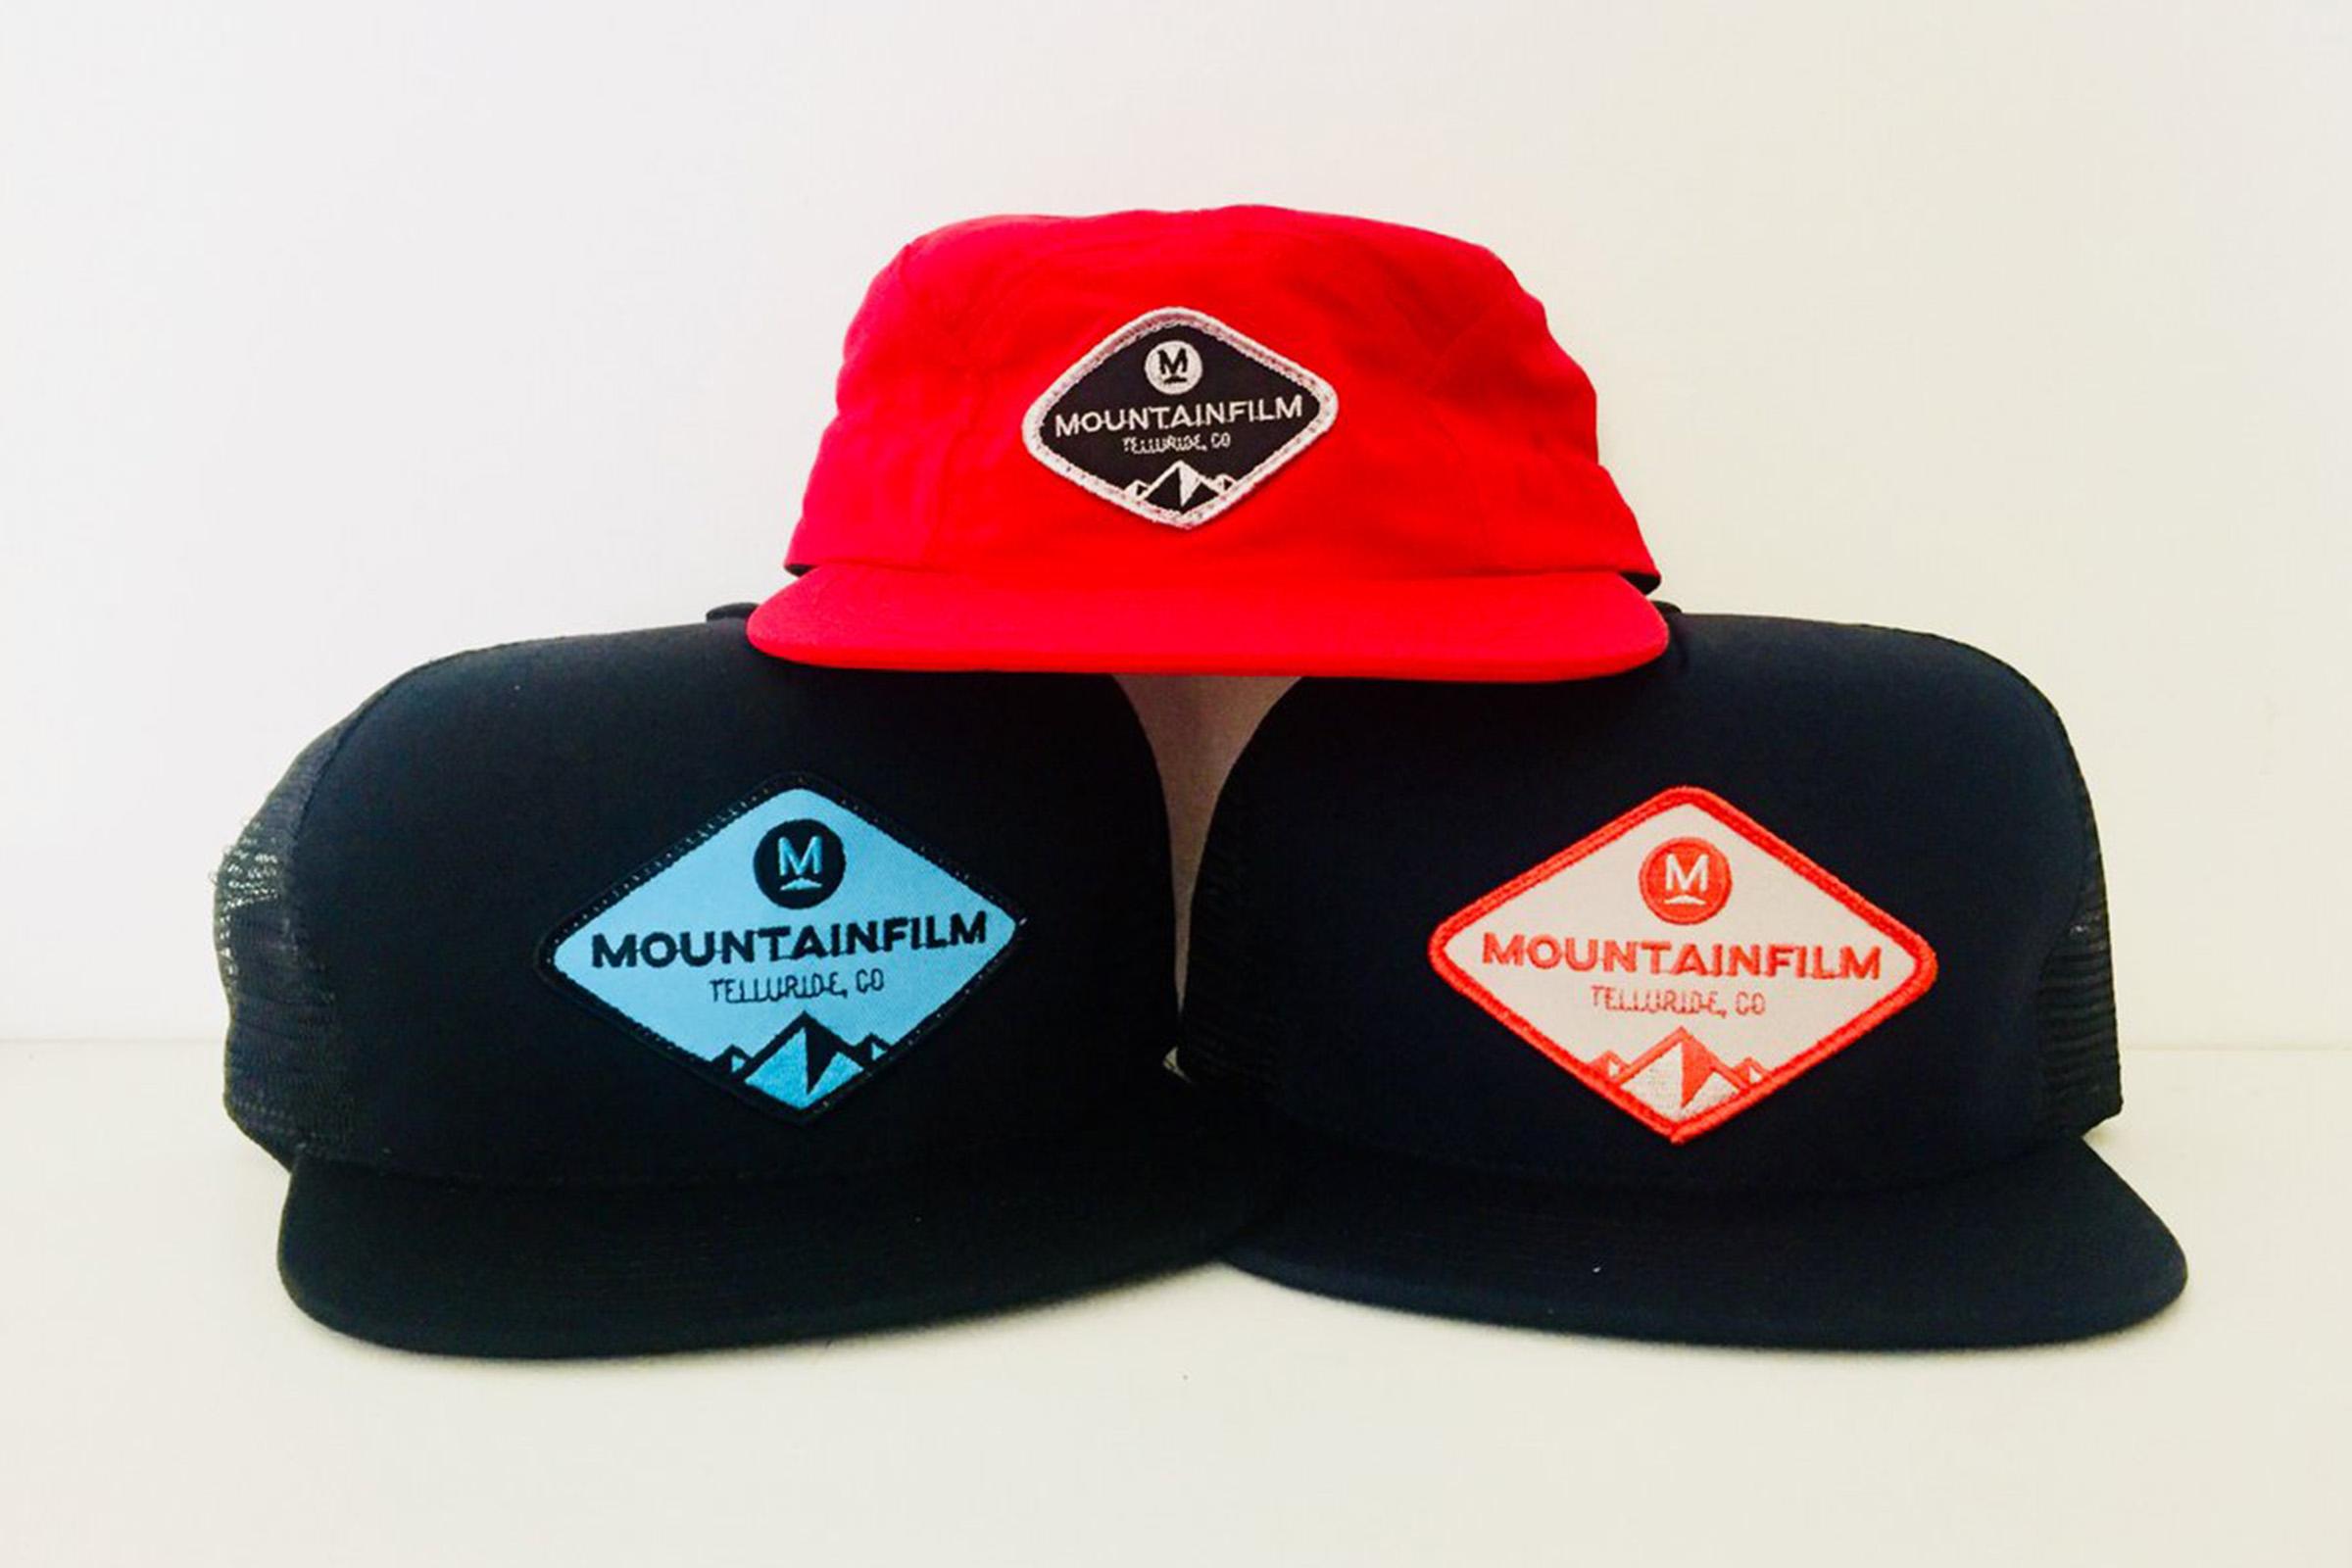 Mountainfilm_hats